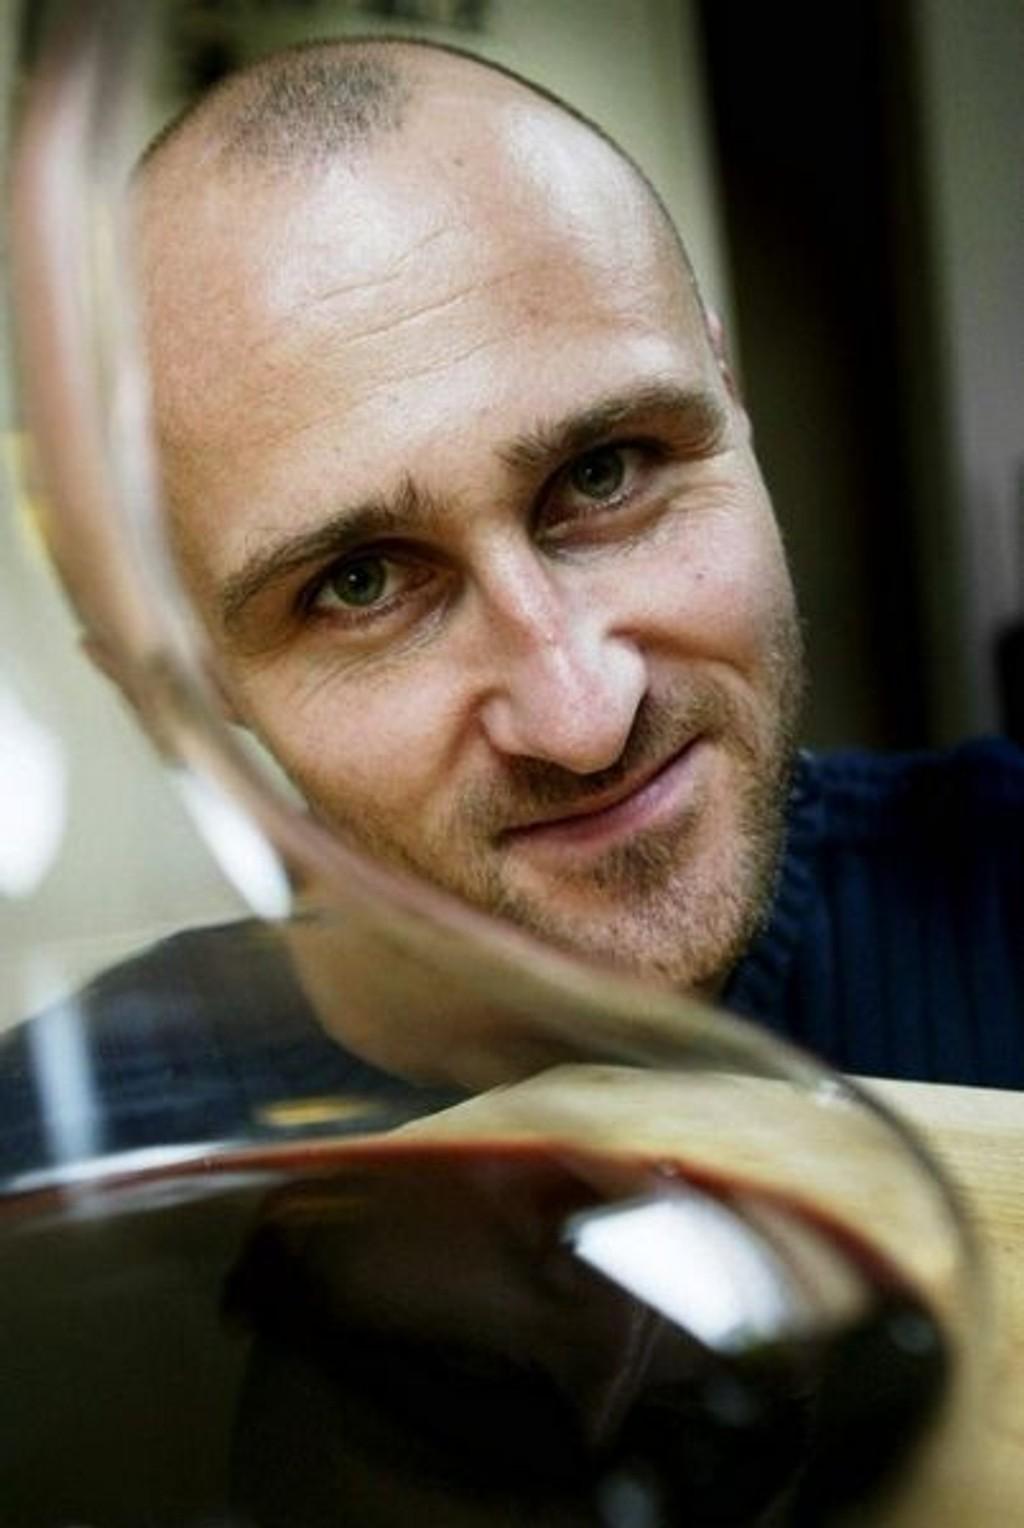 EKSPERT: Ole Martin Alfsen er vinkelner og fagansvarlig for mat og drikke ved Kulinarisk Akademi. Han er også ansvarlig for vinkelnerutdannelsen i Norge.